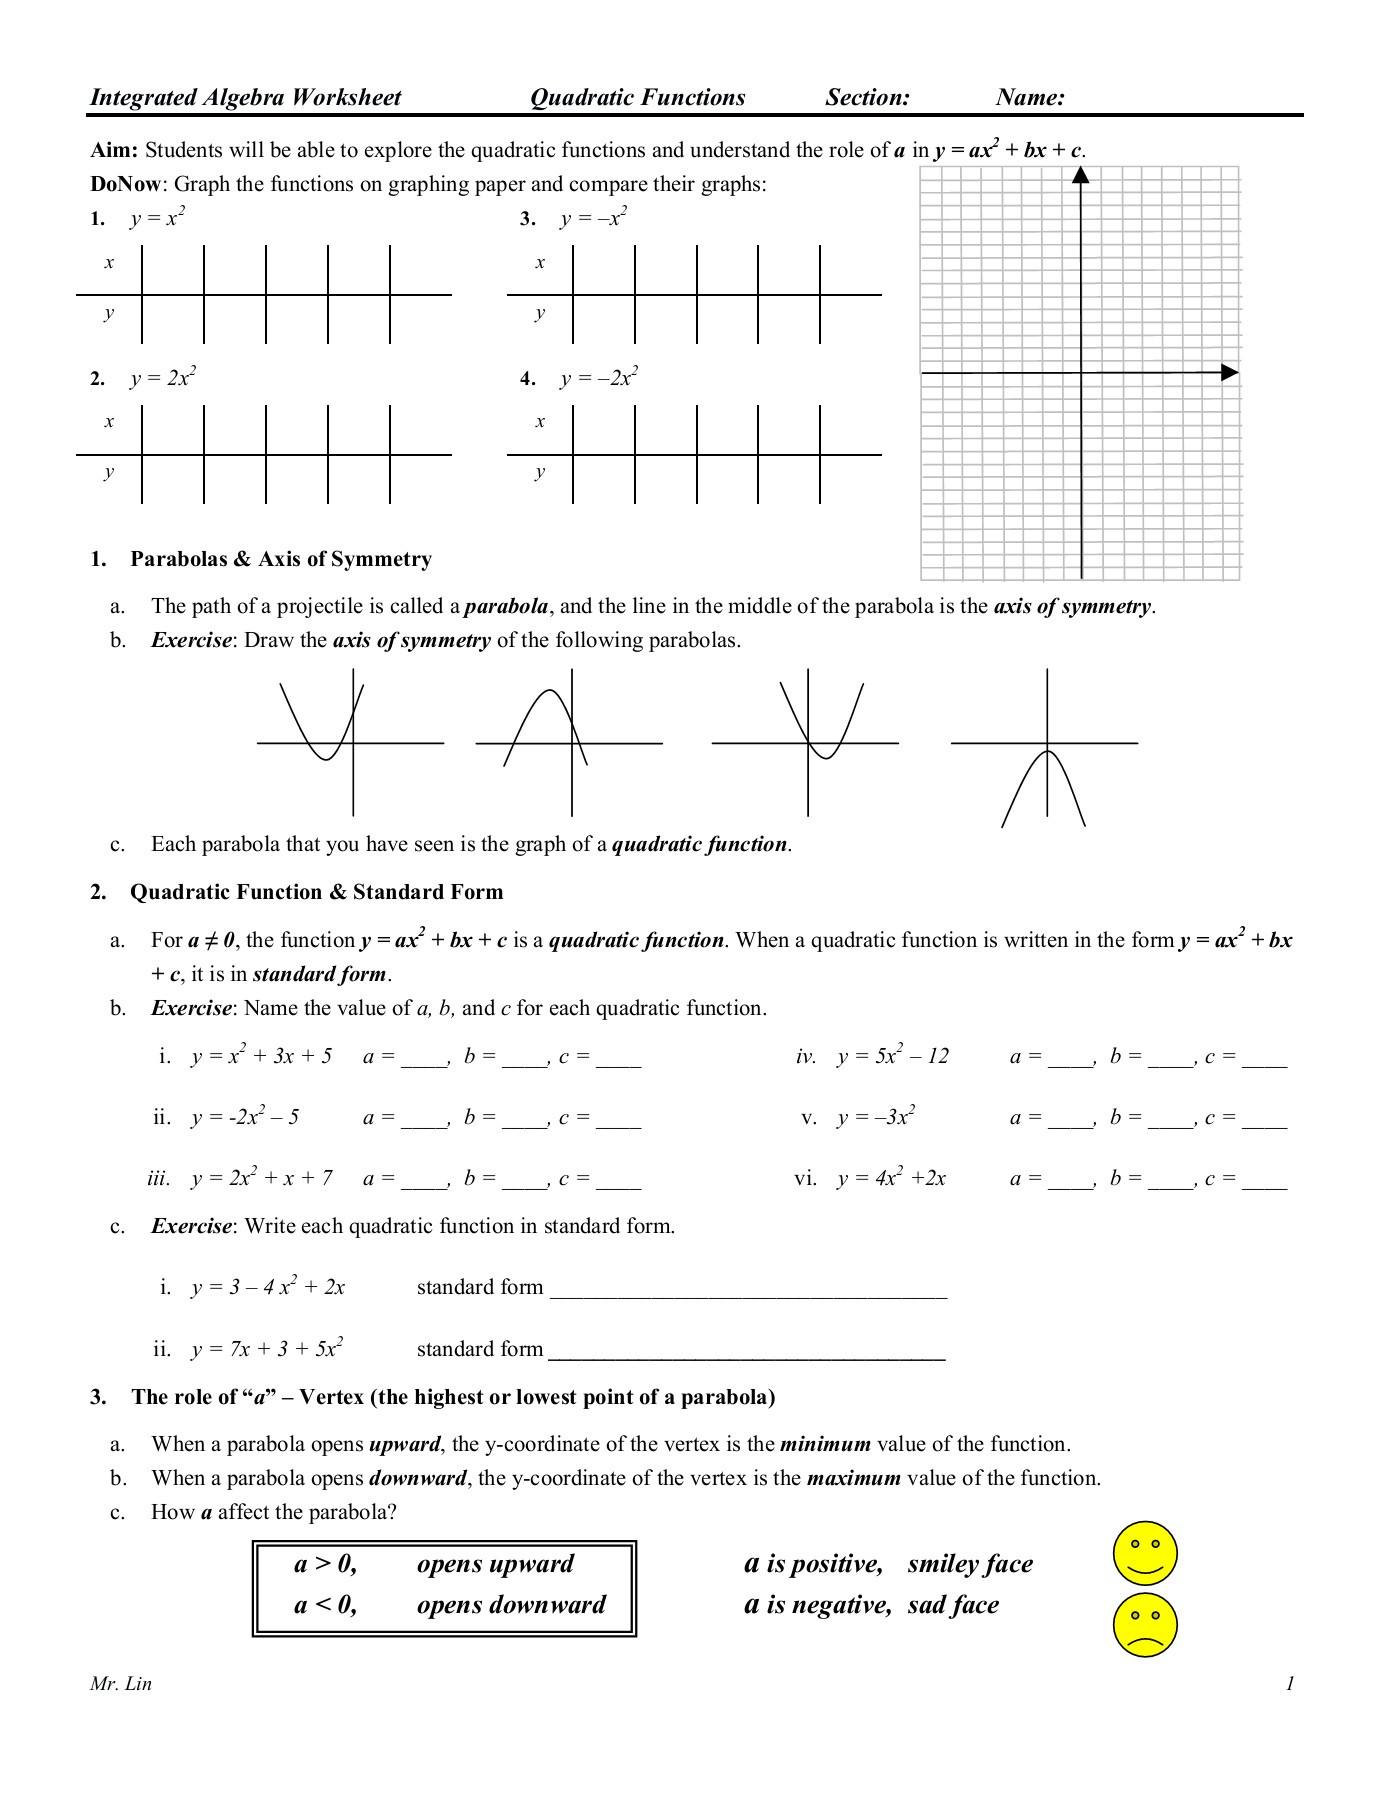 Graphing Quadratic Functions Worksheet Algebra Worksheet 09 Qudratic Functions Pages 1 5 Text